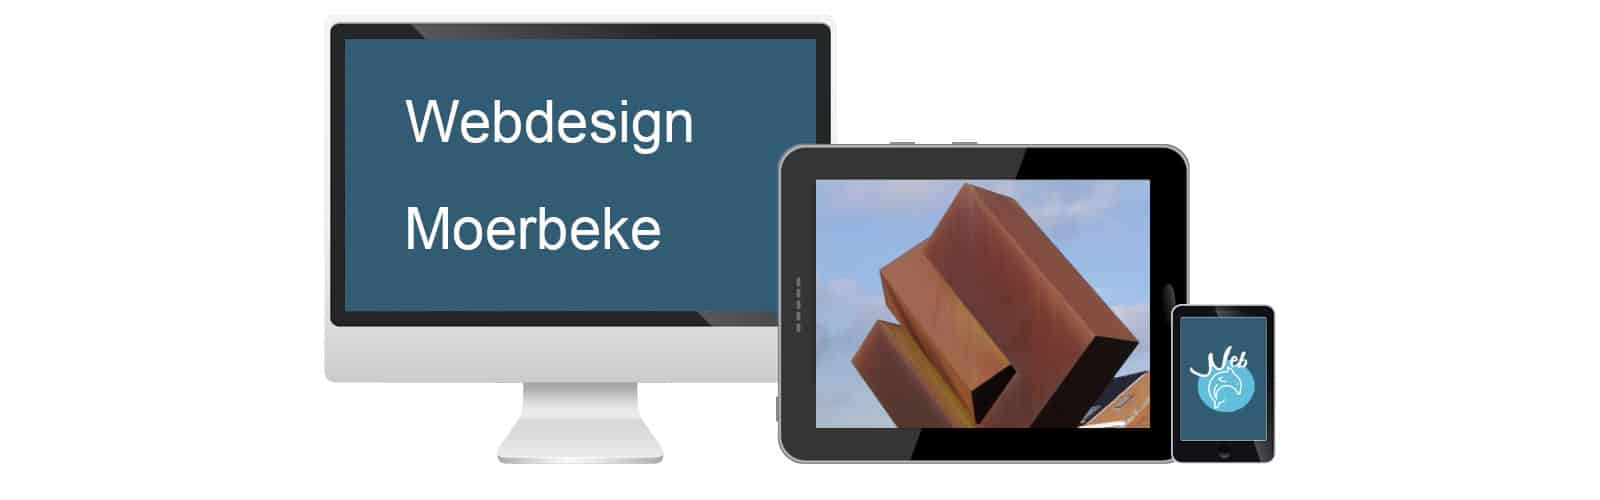 Webdesign Moerbeke - webdolfijn